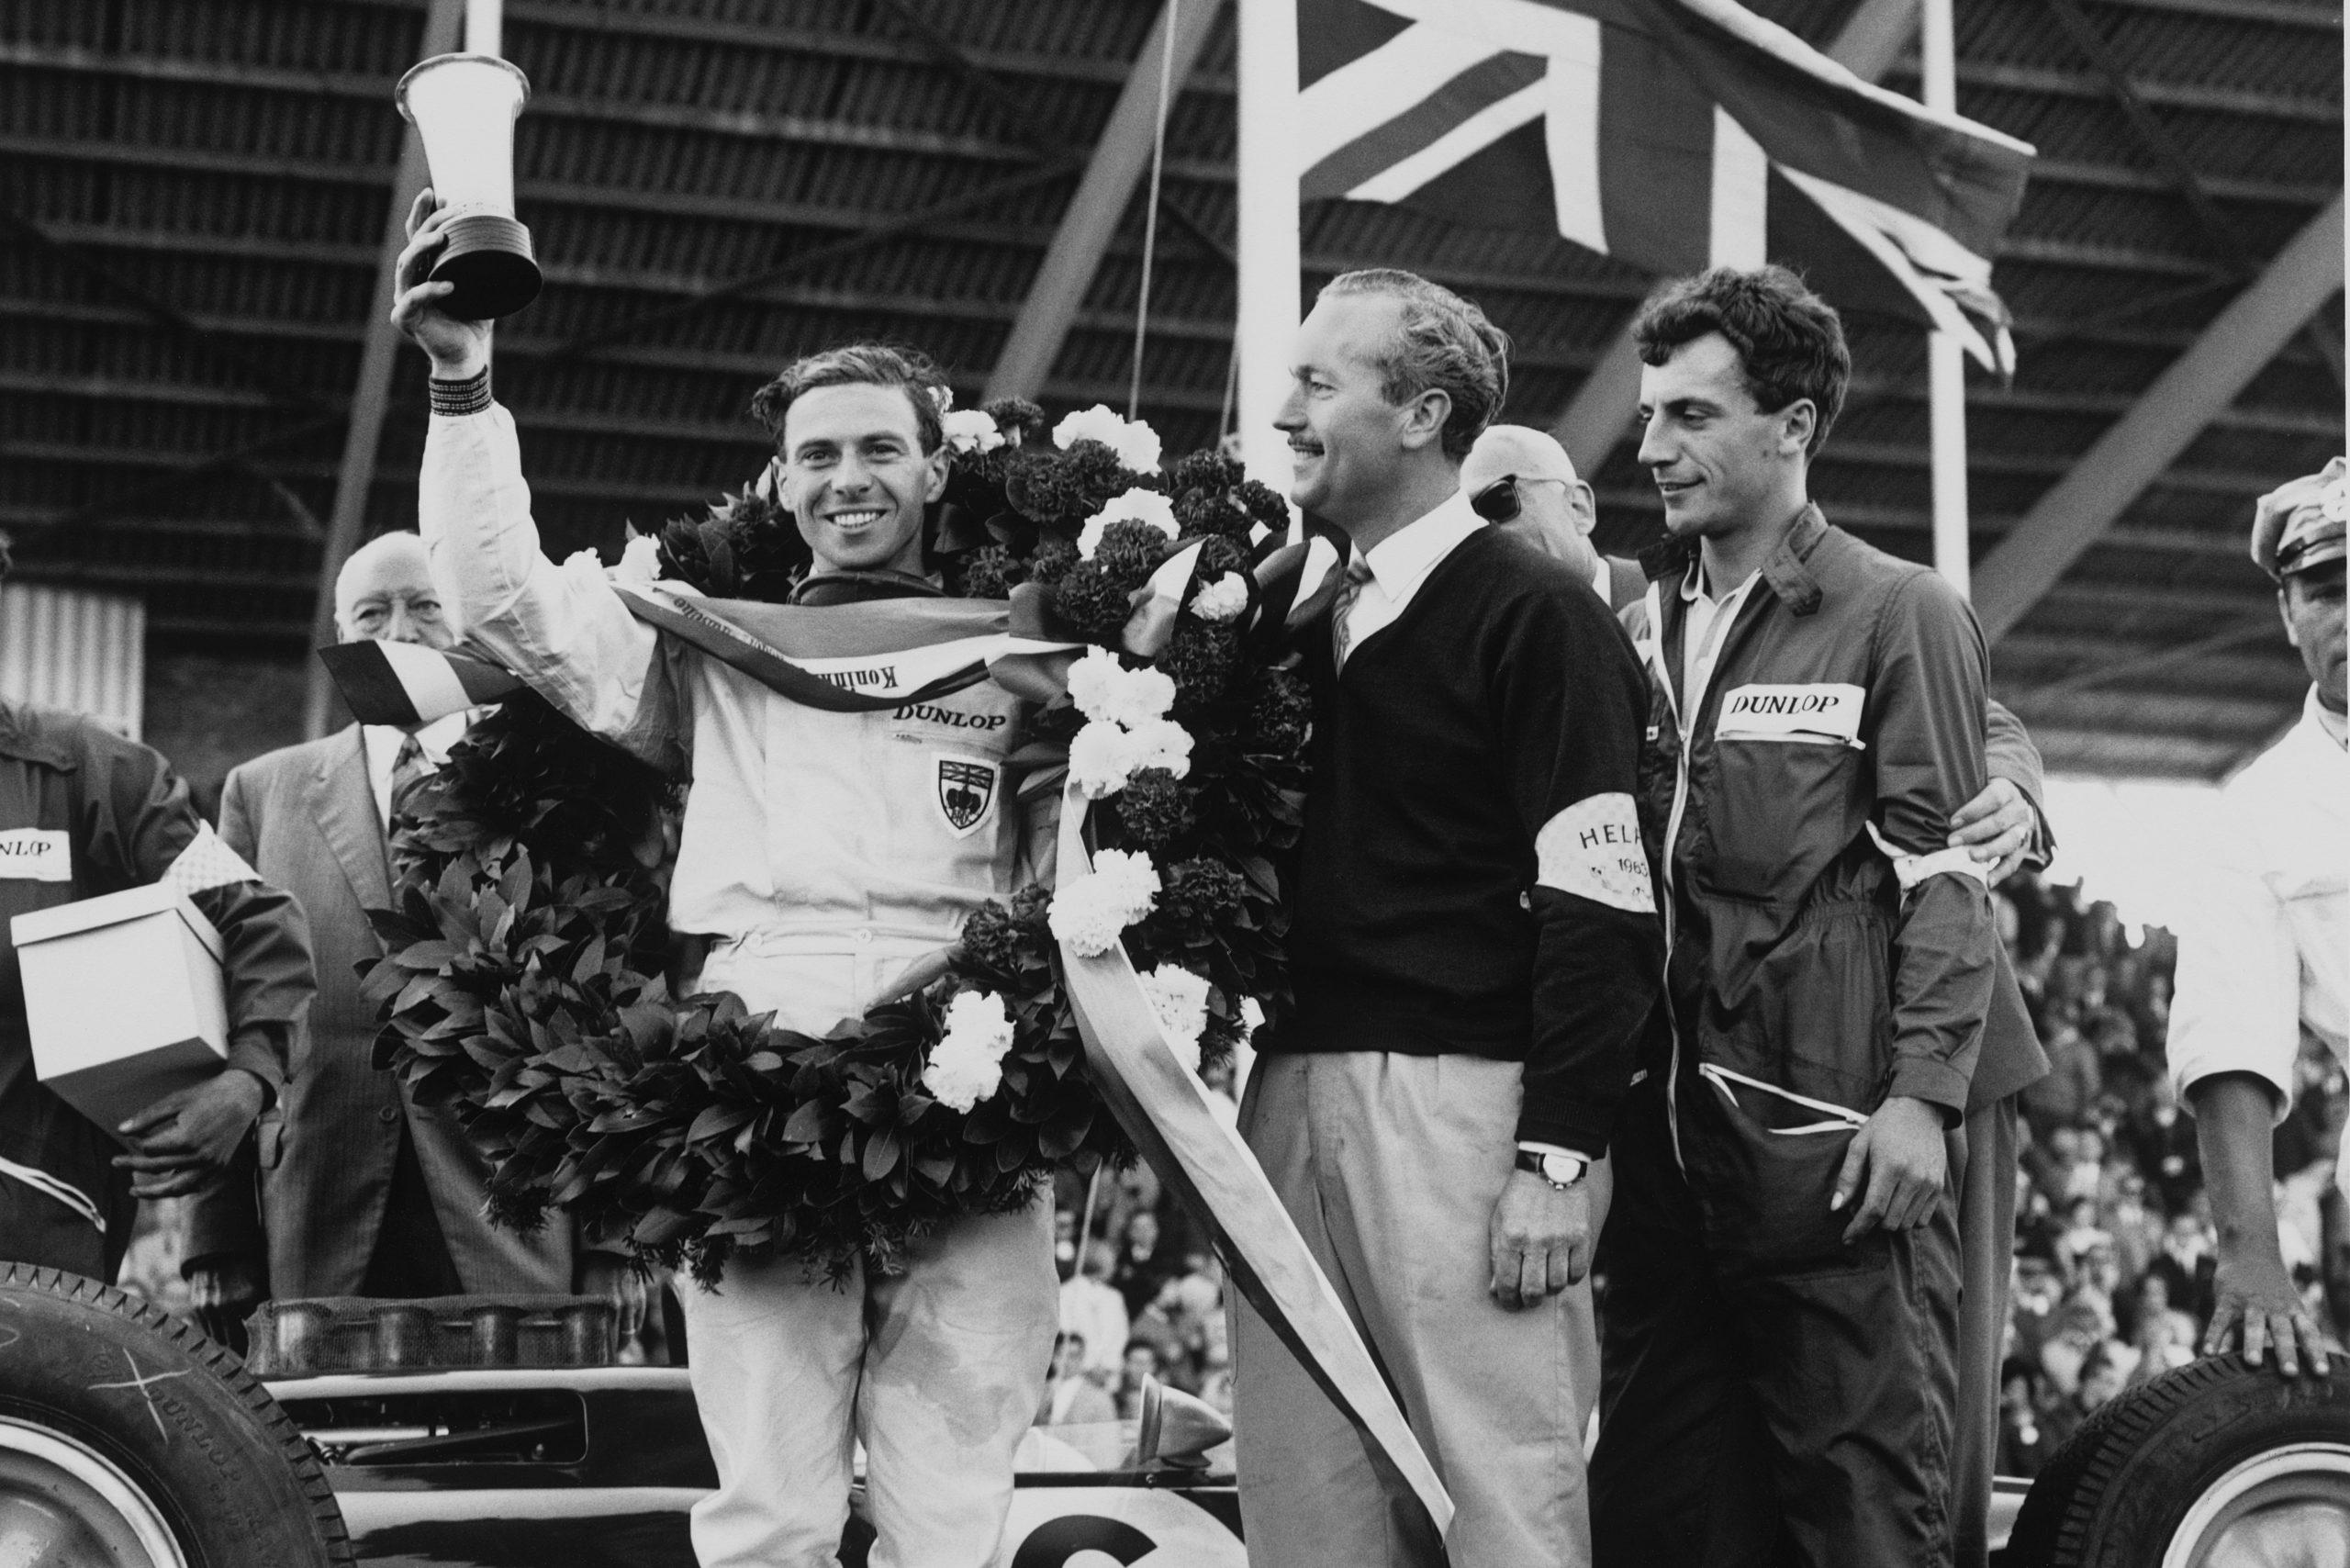 Winner Jim Clark on the podium with Colin Chapman.